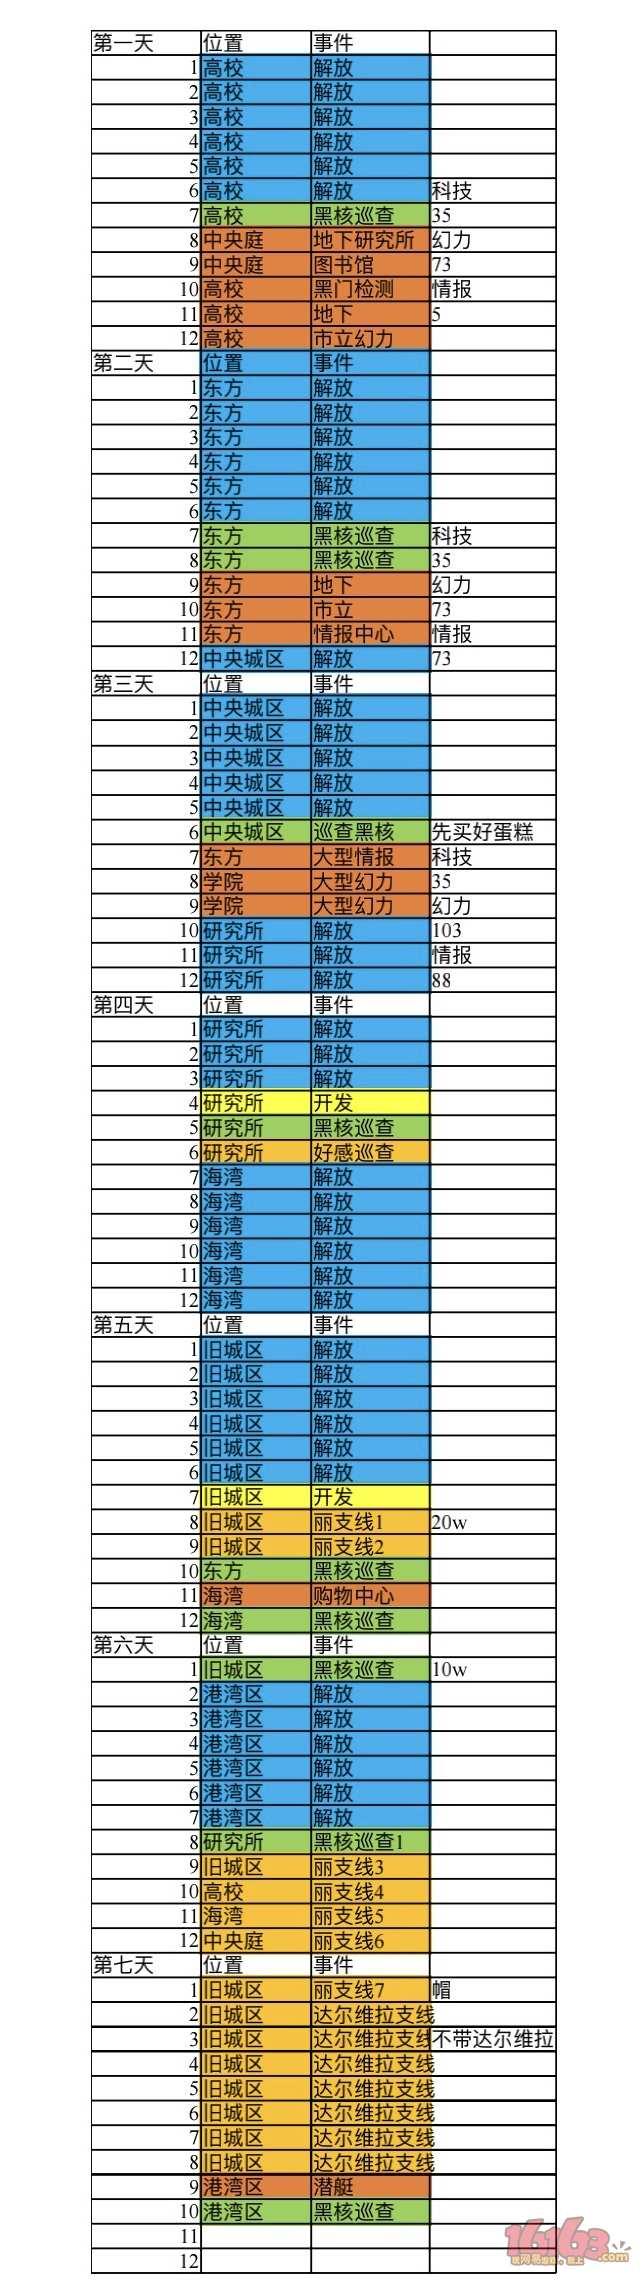 A74DDE33-DACD-4F3D-8B92-EE640A8E5F0B.jpeg